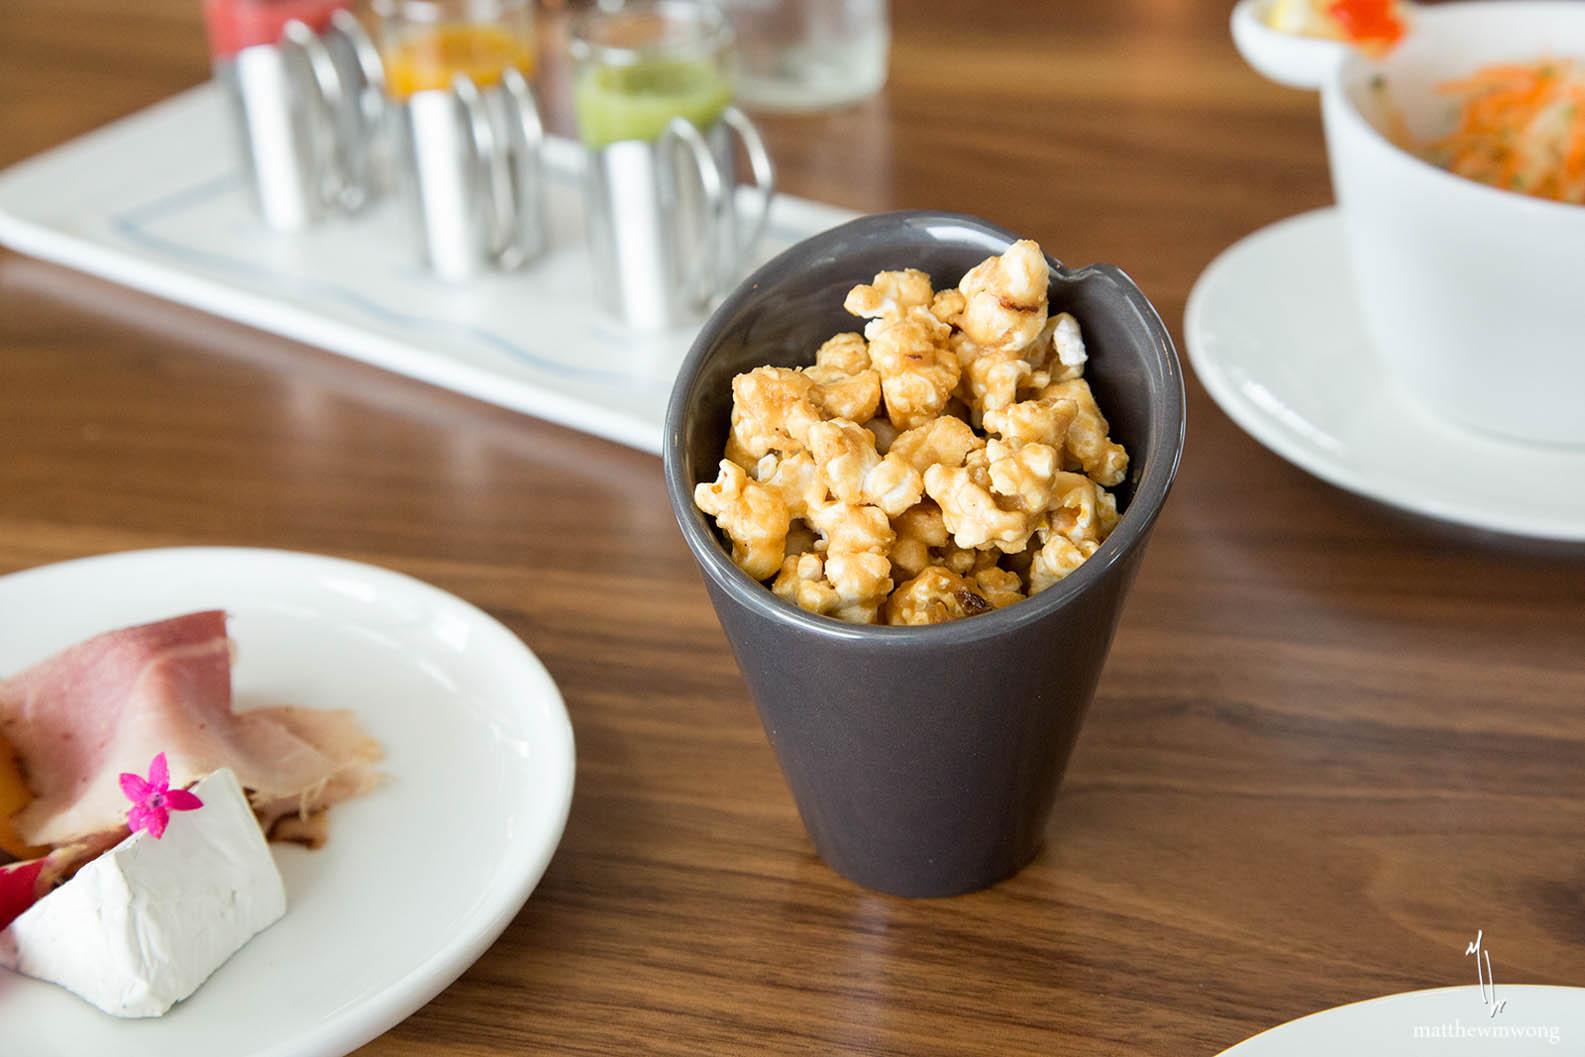 Benton's Bacon Carmel Popcorn